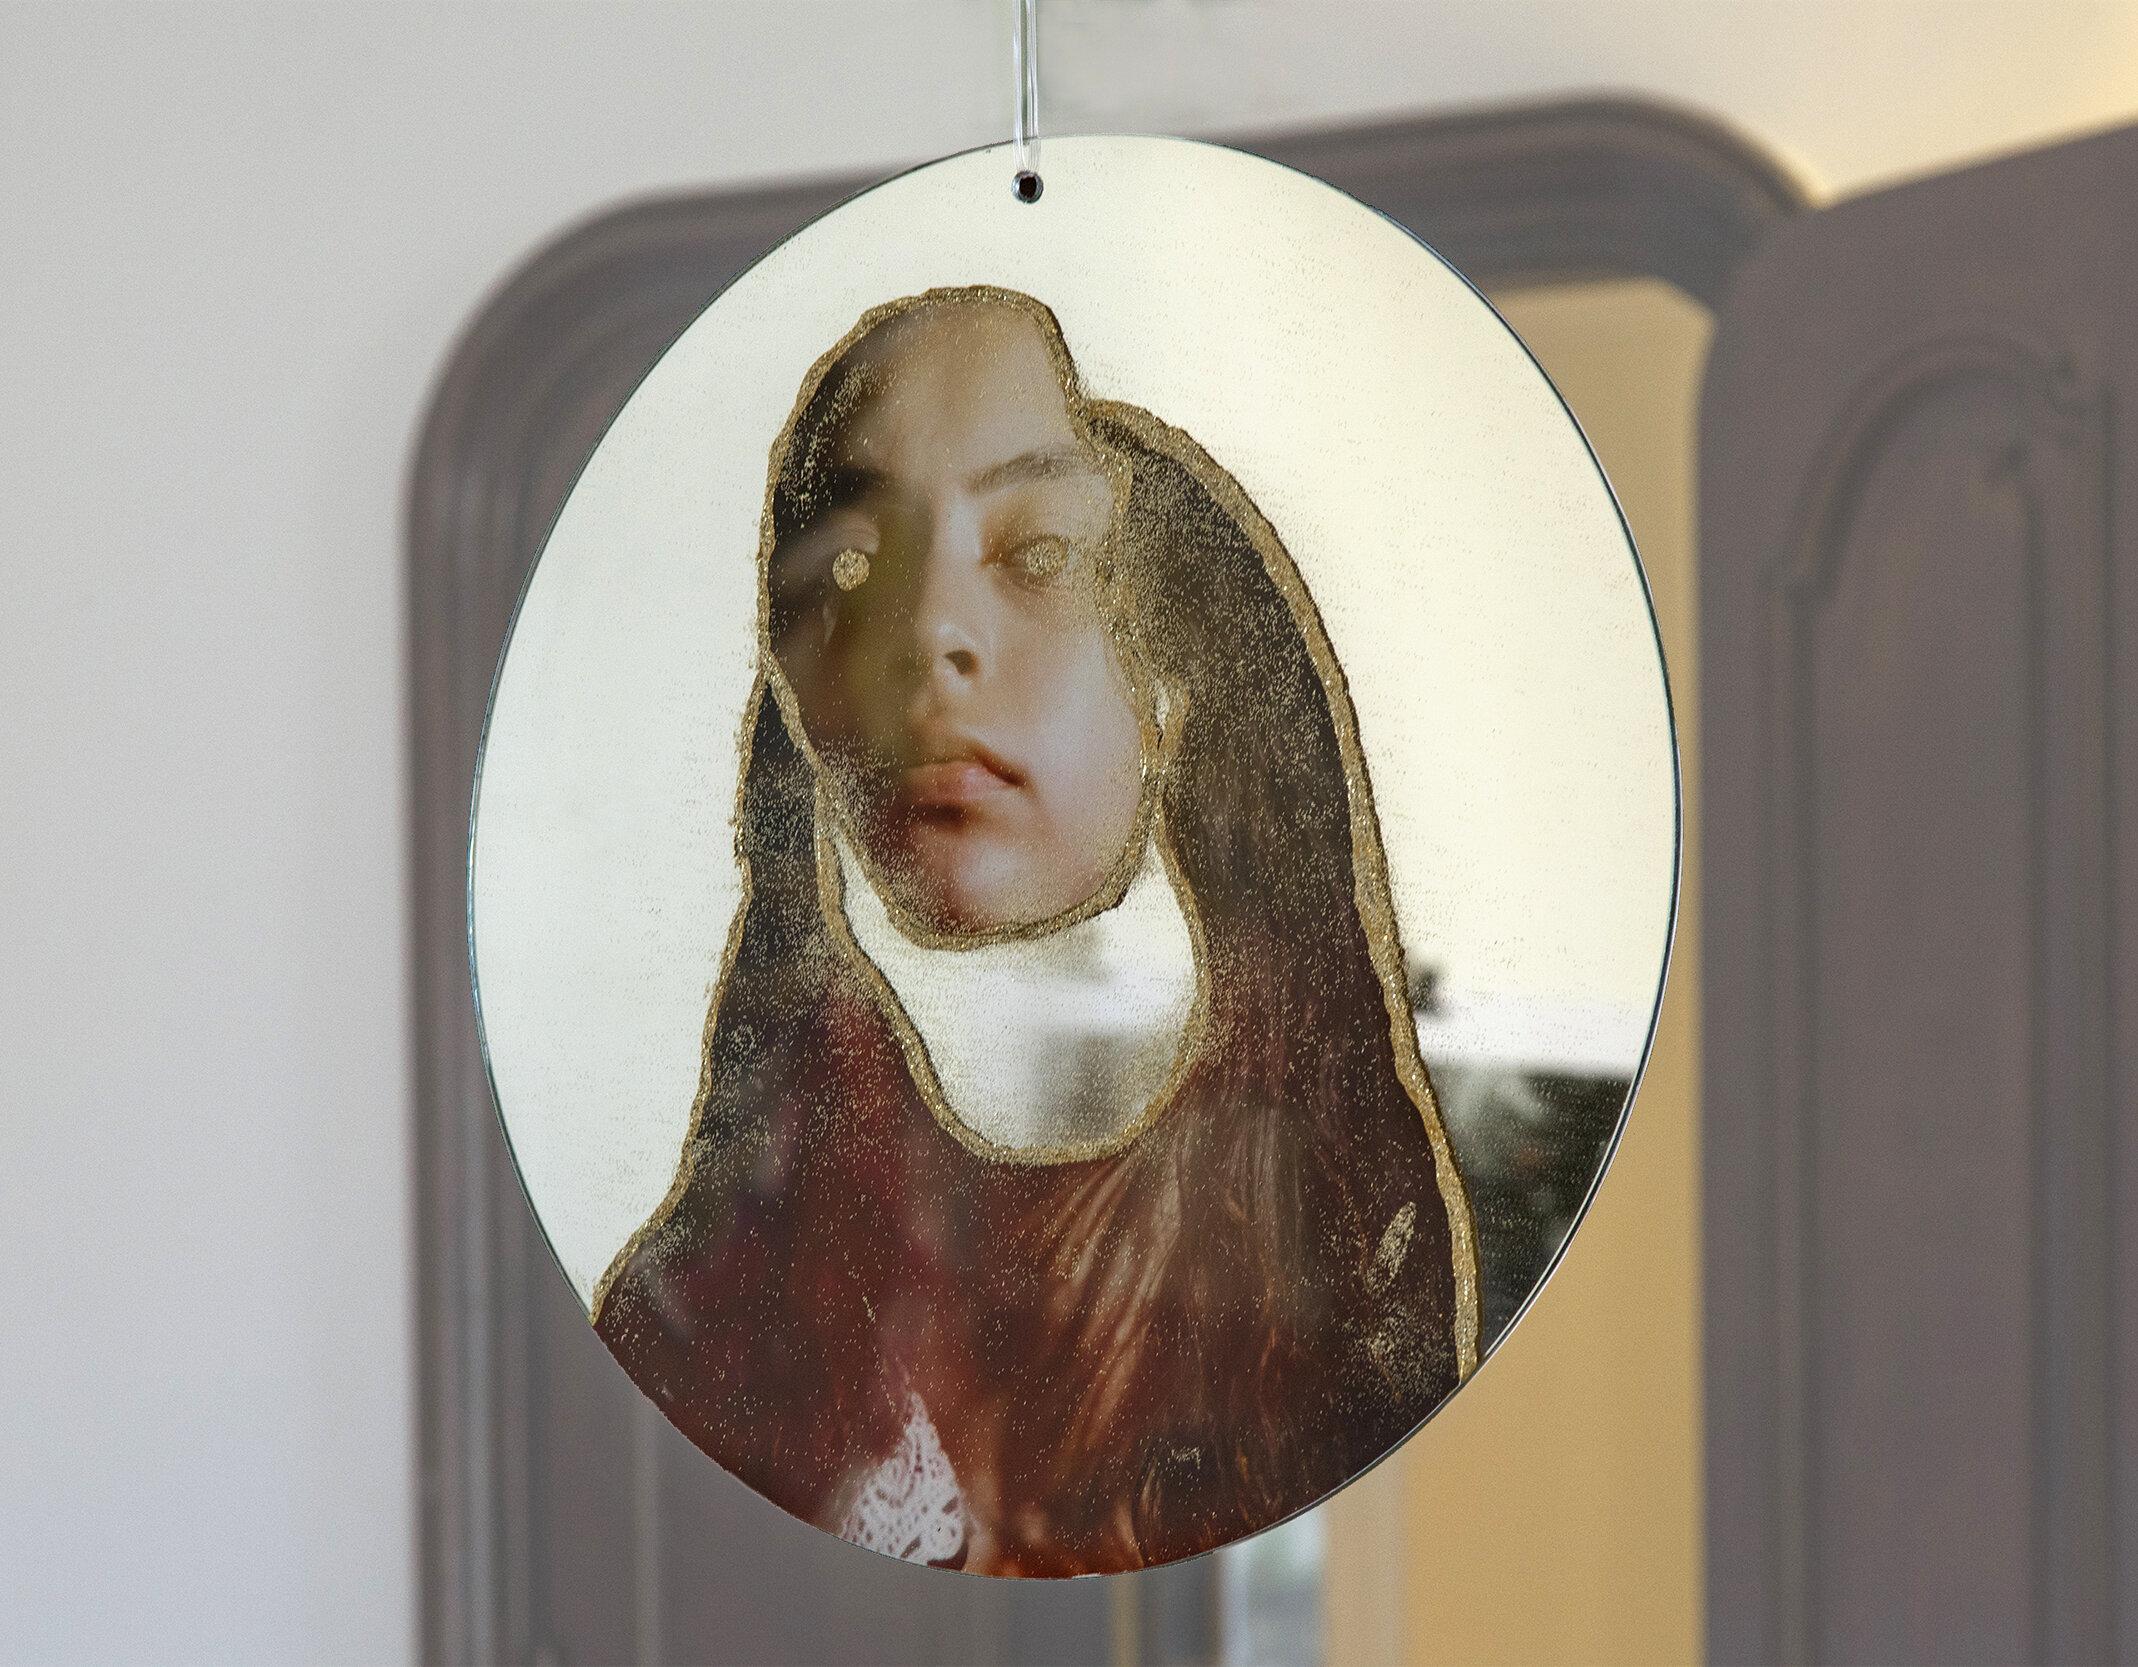 2 faced , side 02, Gyclee print on mirror, acrylic gel+glitter, 20x20in, oval, 2019